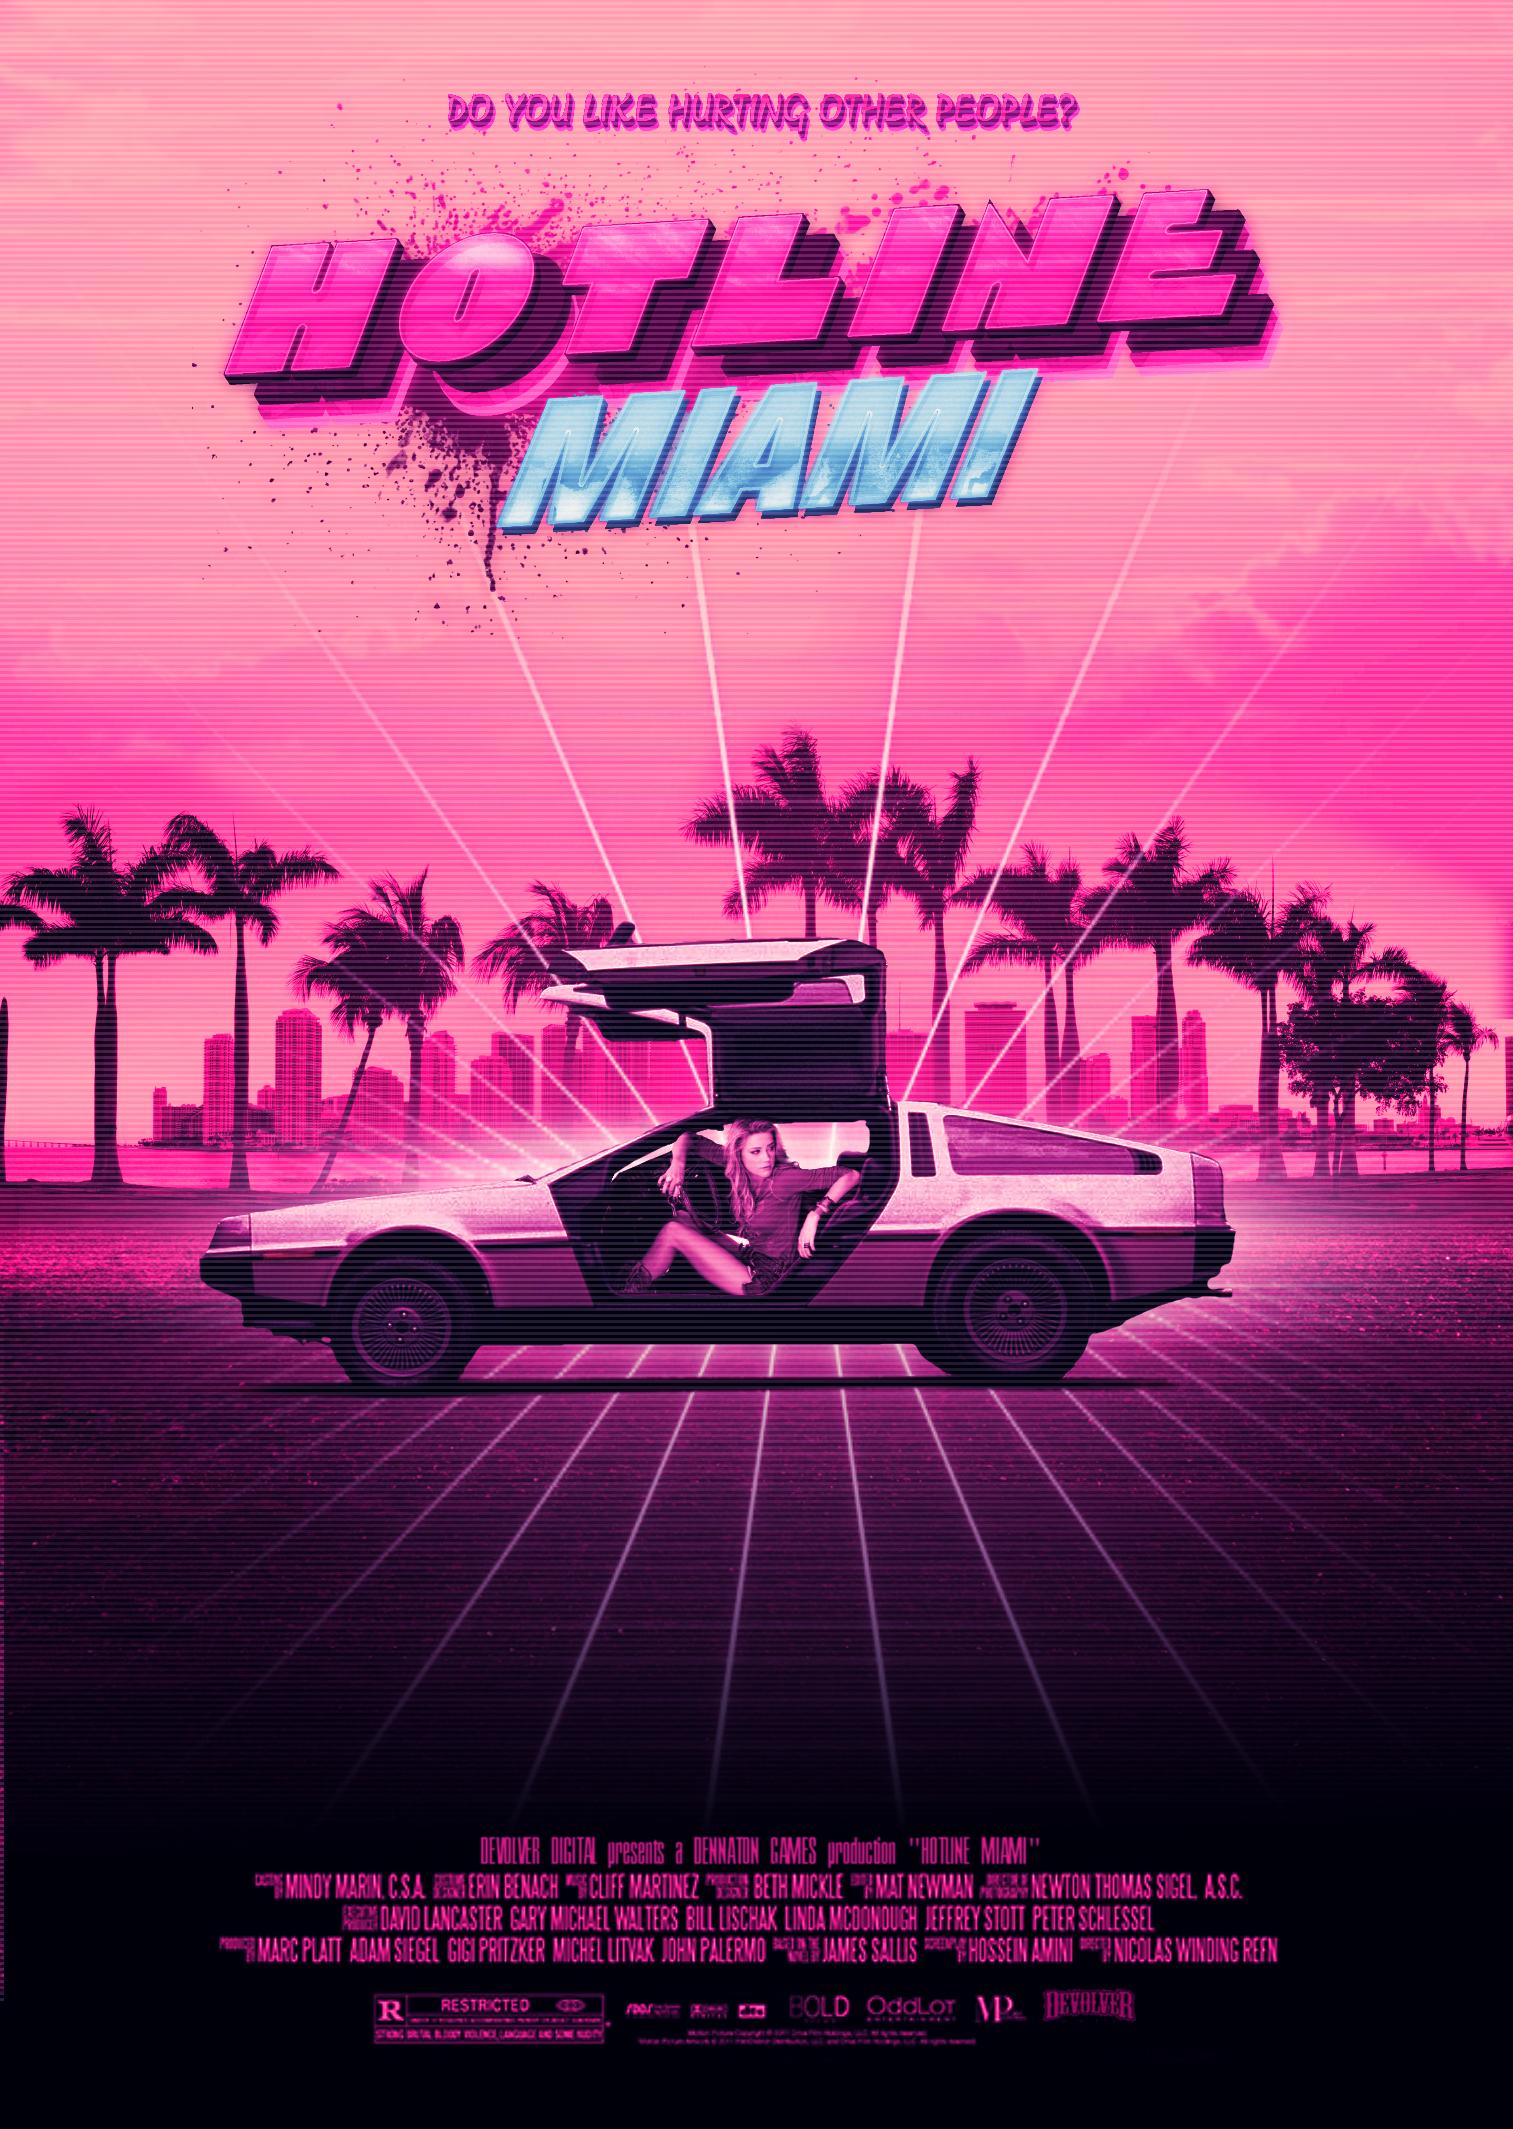 Hotline Miami Hotline Miami Retro Waves Retro Futurism